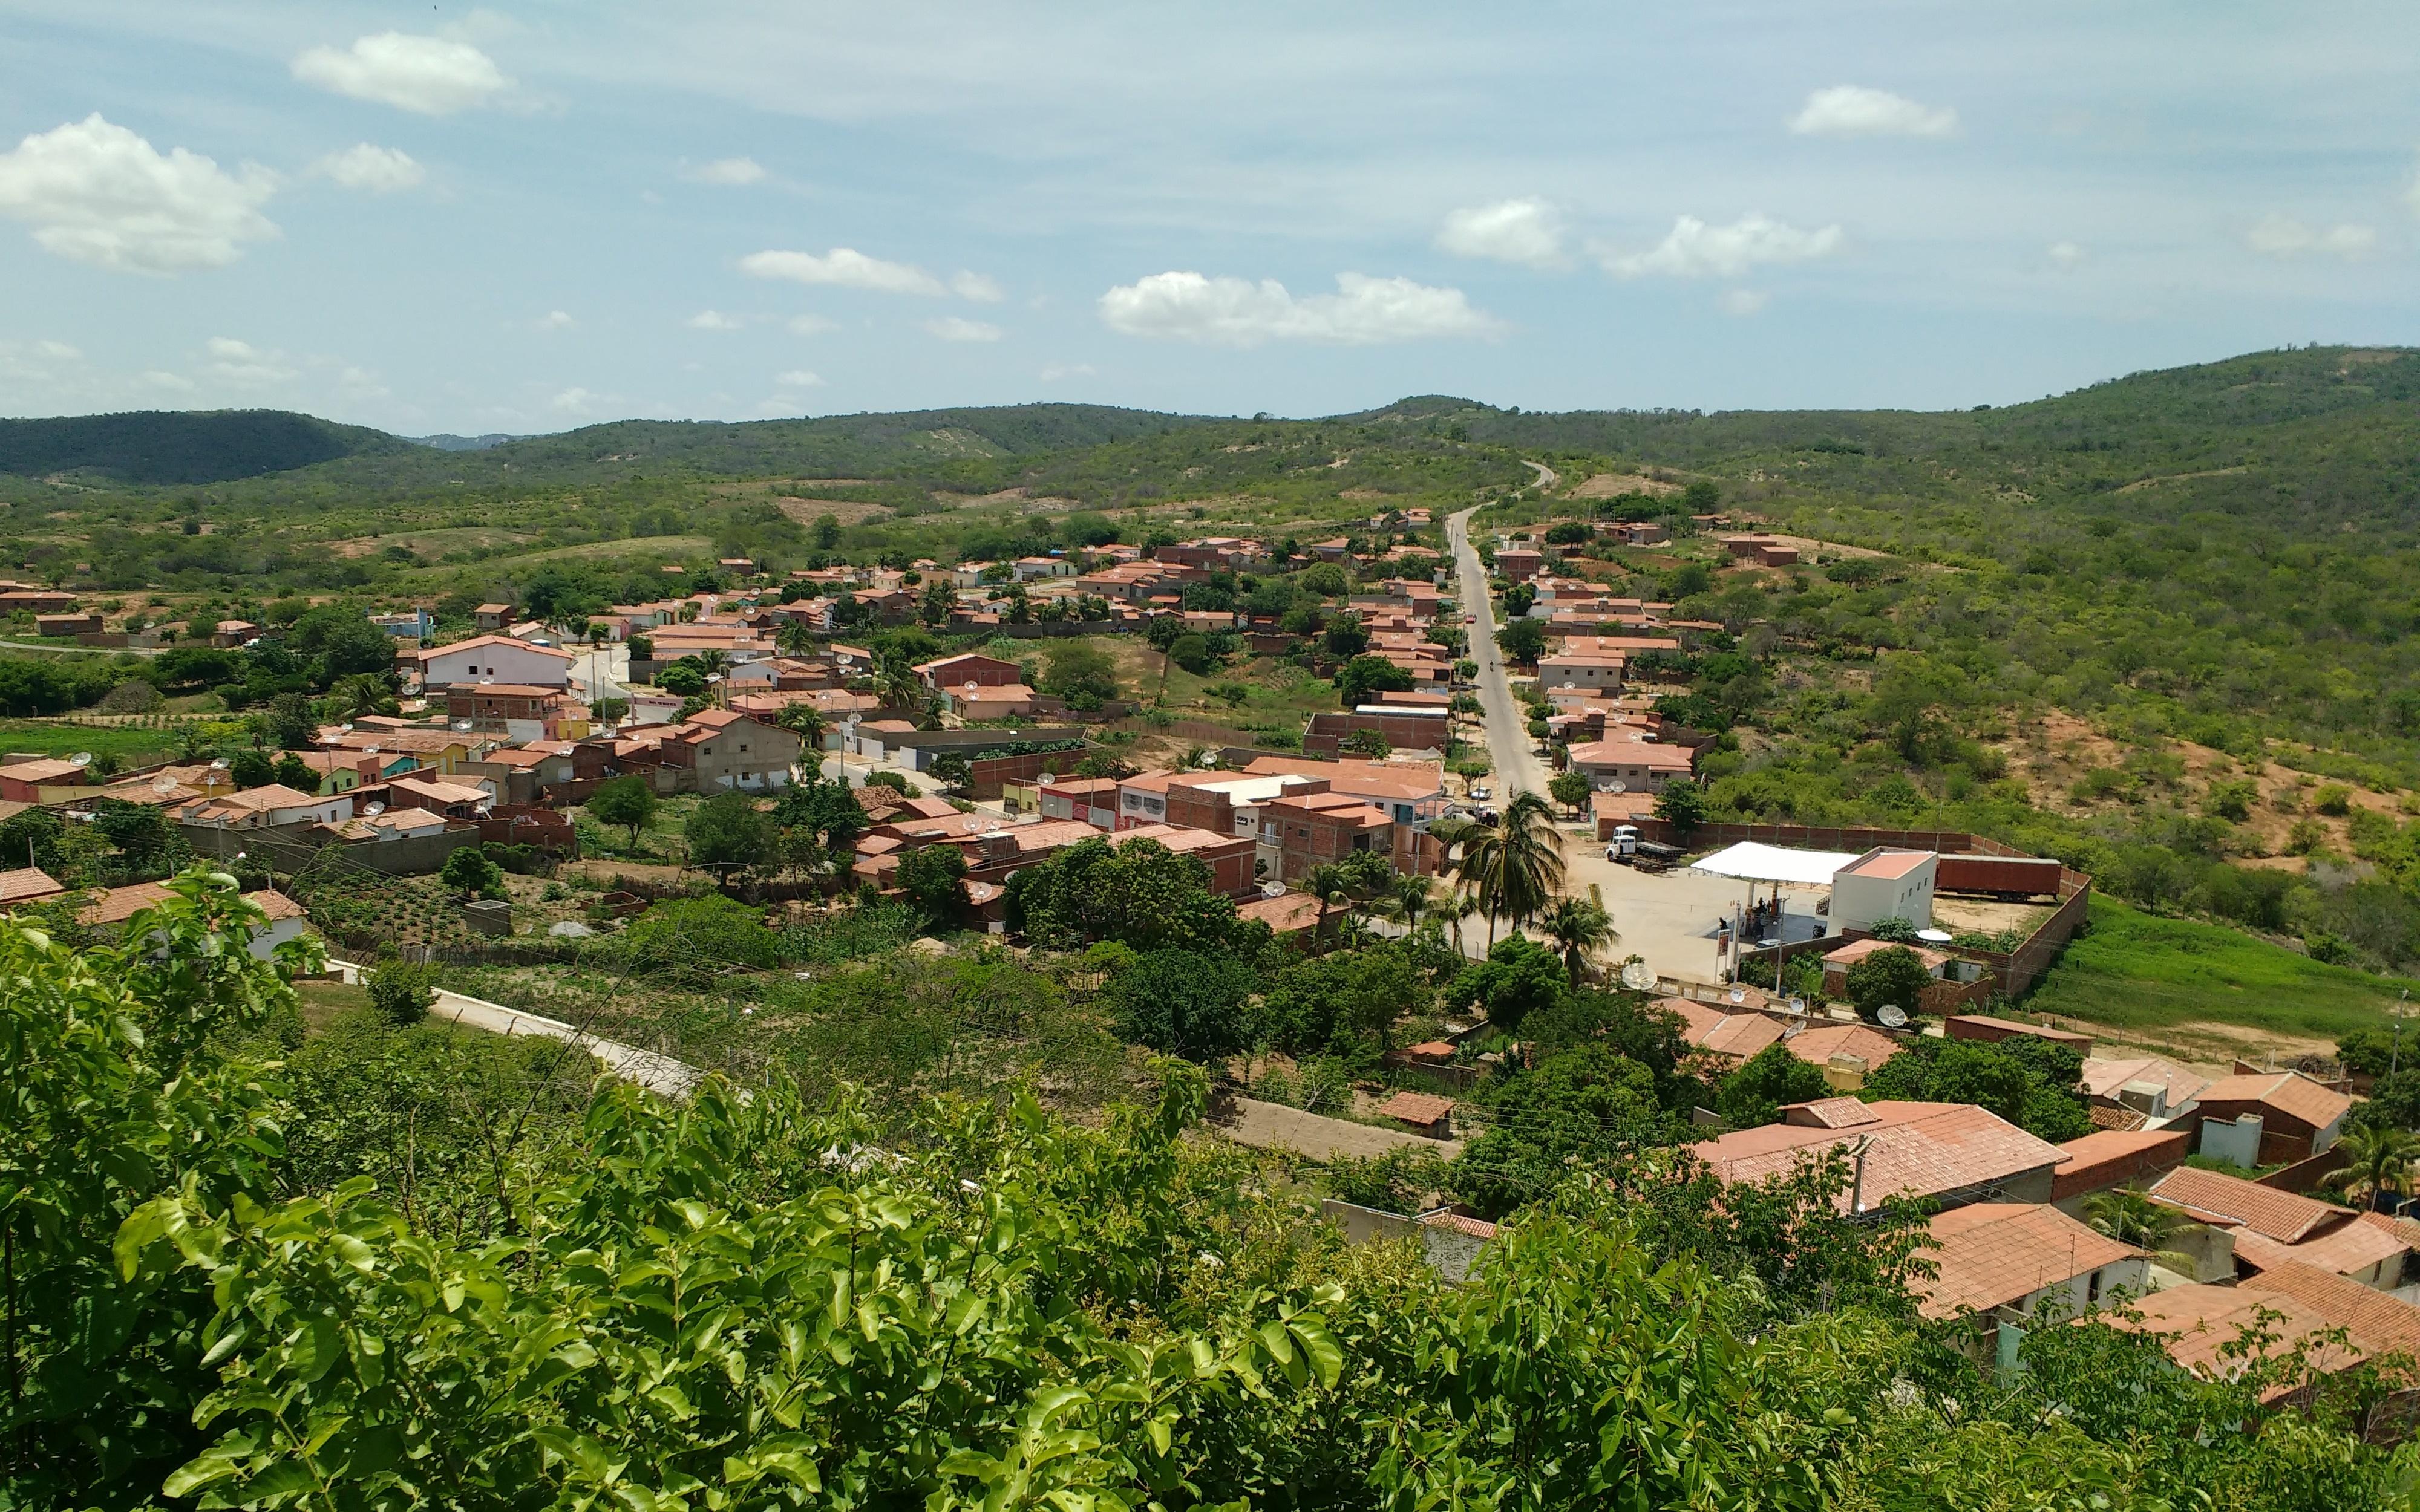 Antônio Martins Rio Grande do Norte fonte: upload.wikimedia.org